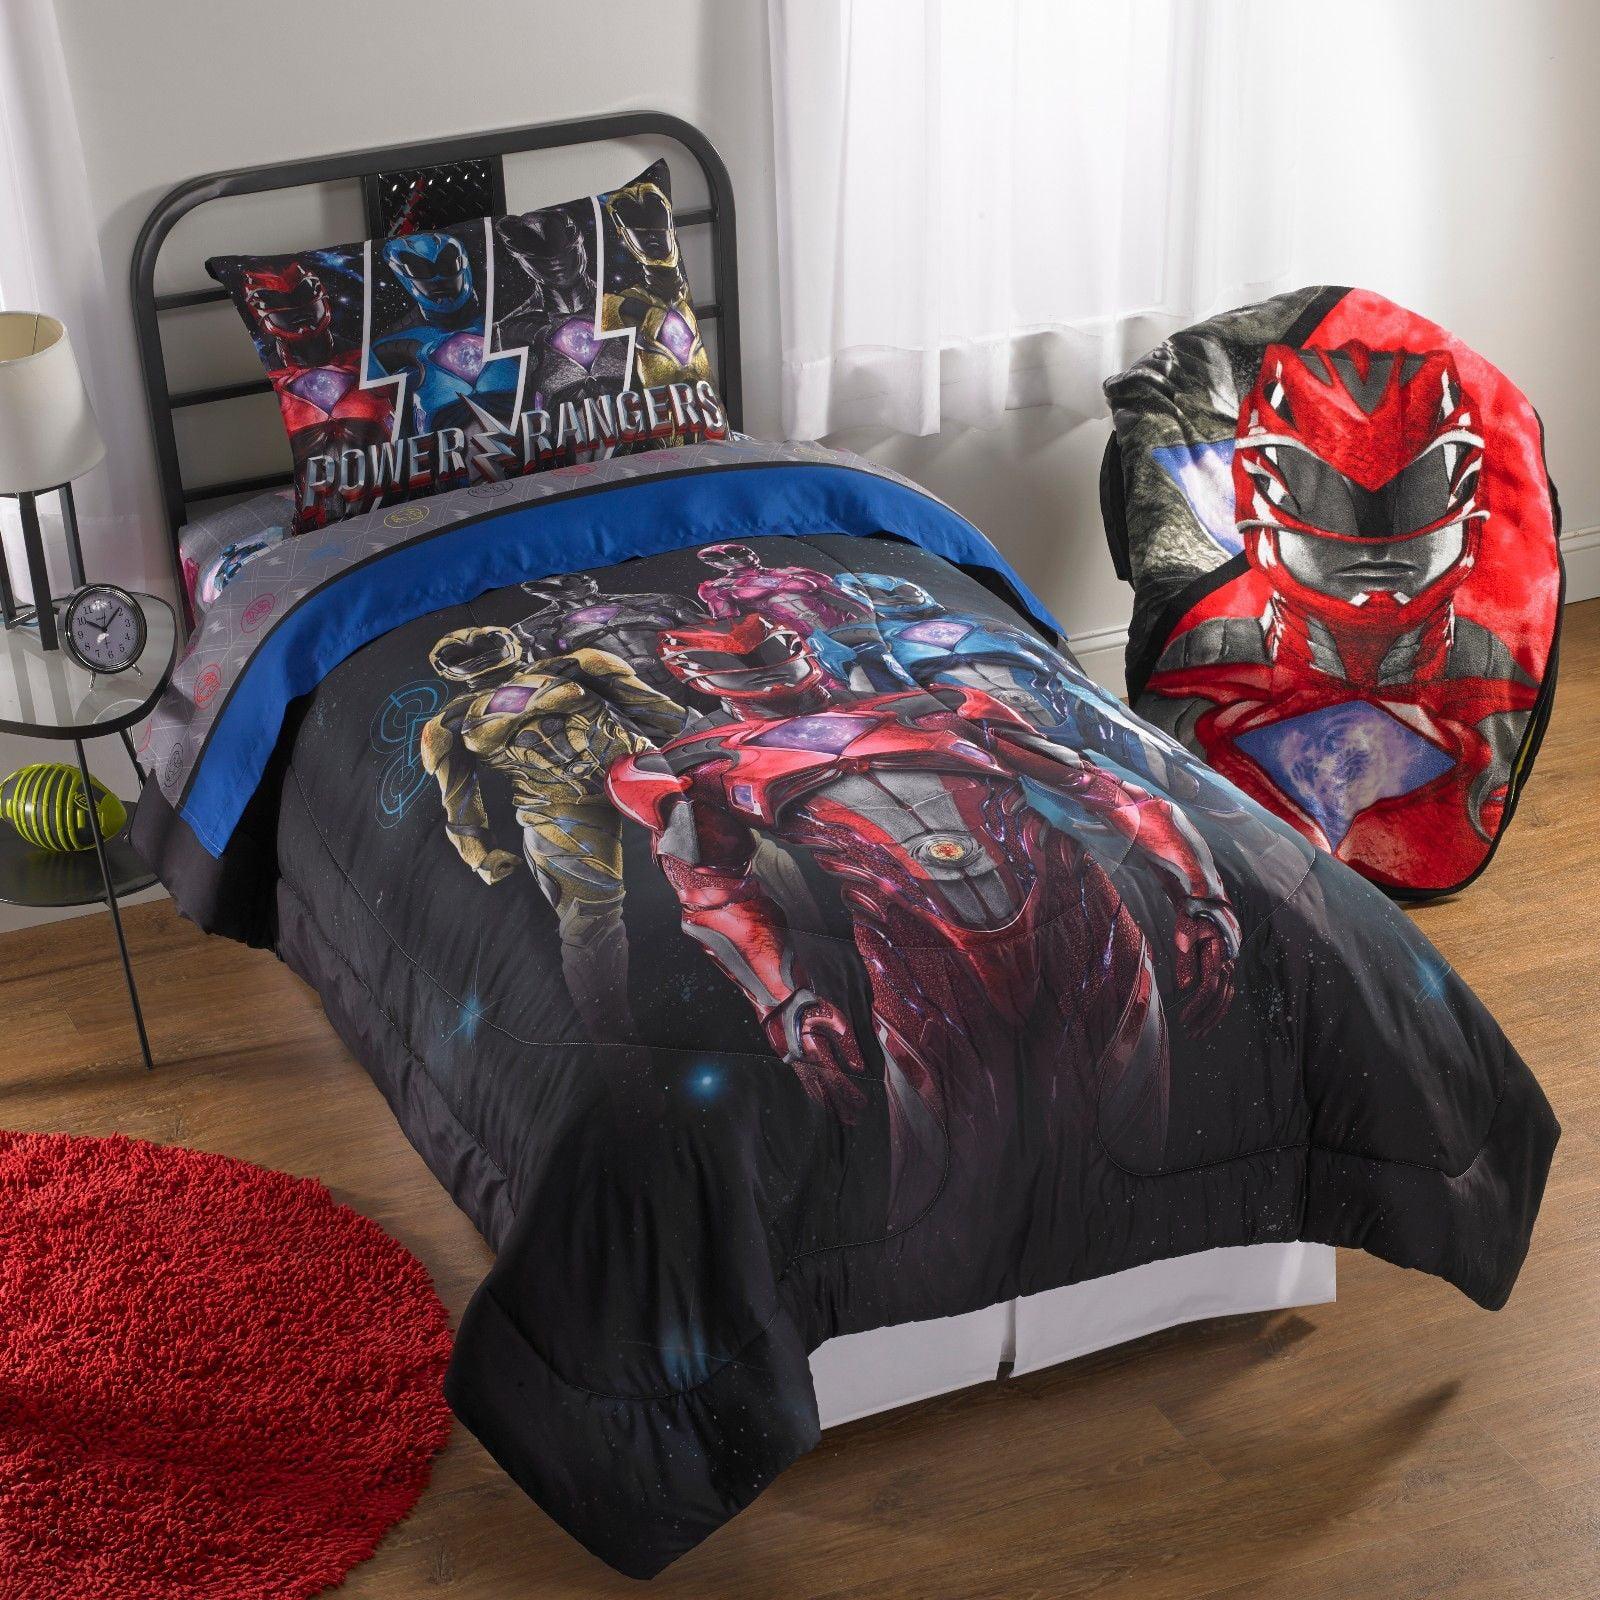 Power Rangers Boys Twin Comforter & Sheet Set (4 Piece Bed In A